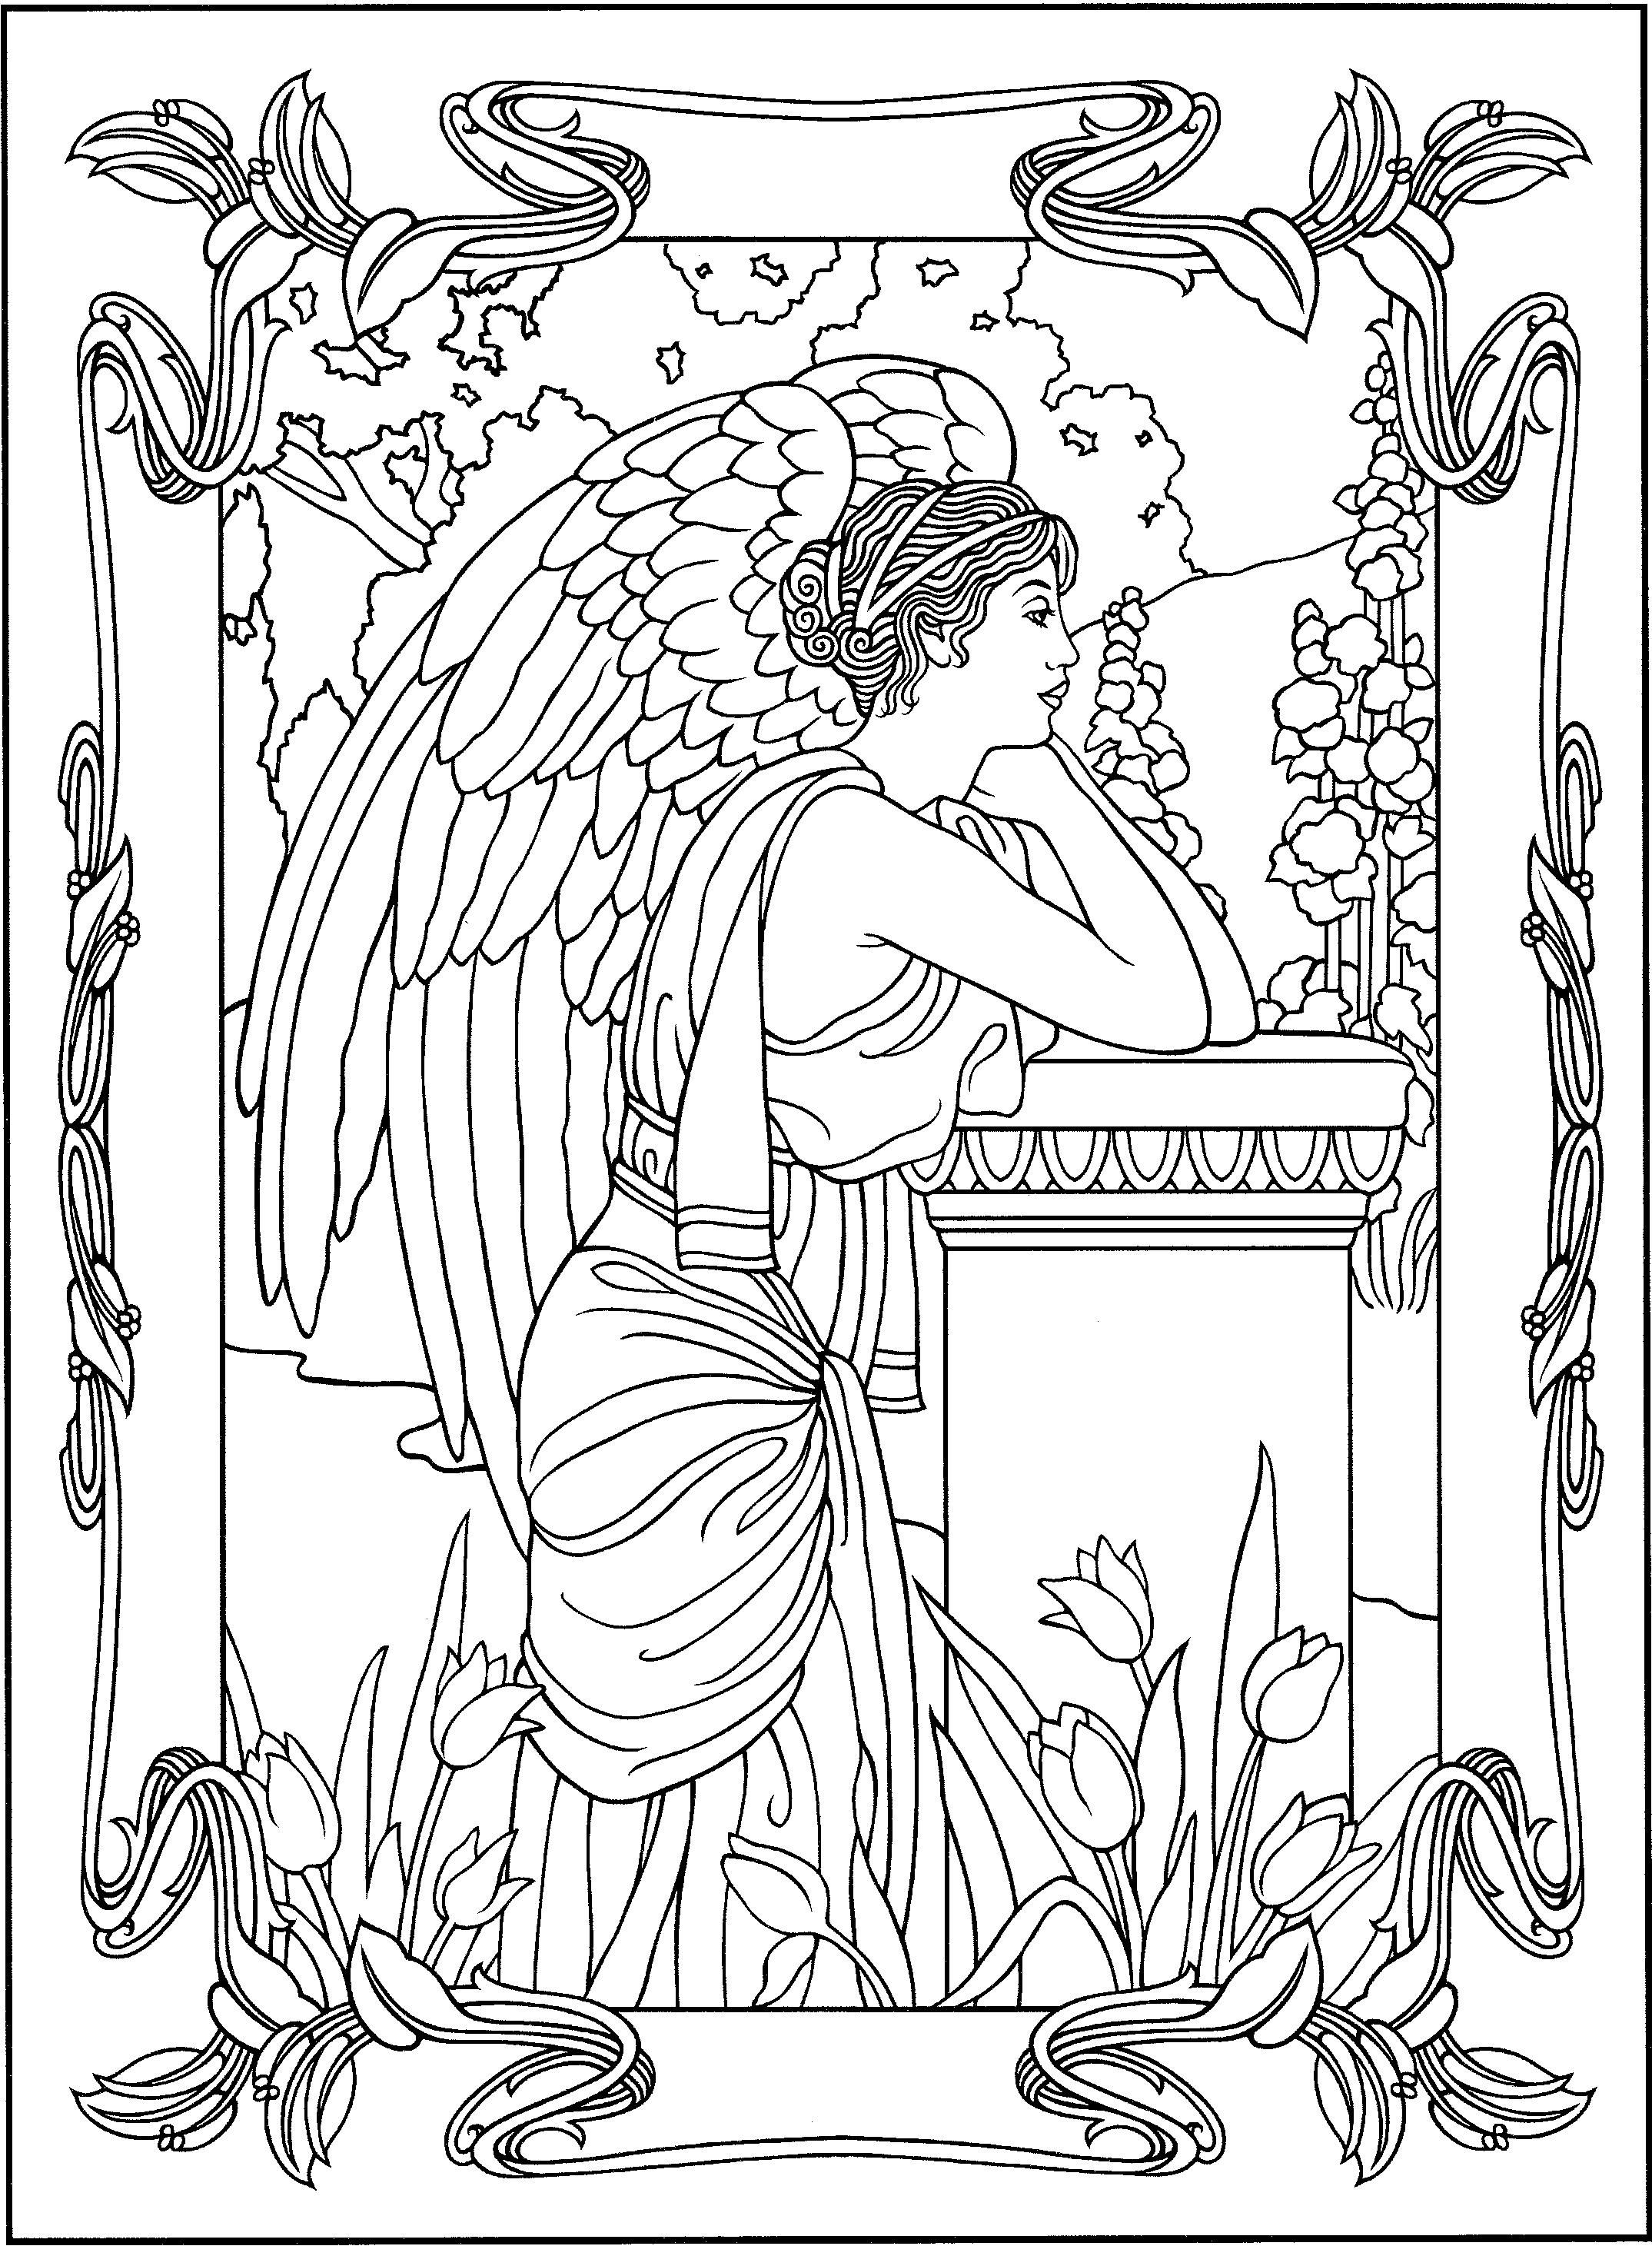 Pin By Princessgrace On Art I Like Angel Coloring Pages Fairy Coloring Pages Mandala Coloring Pages